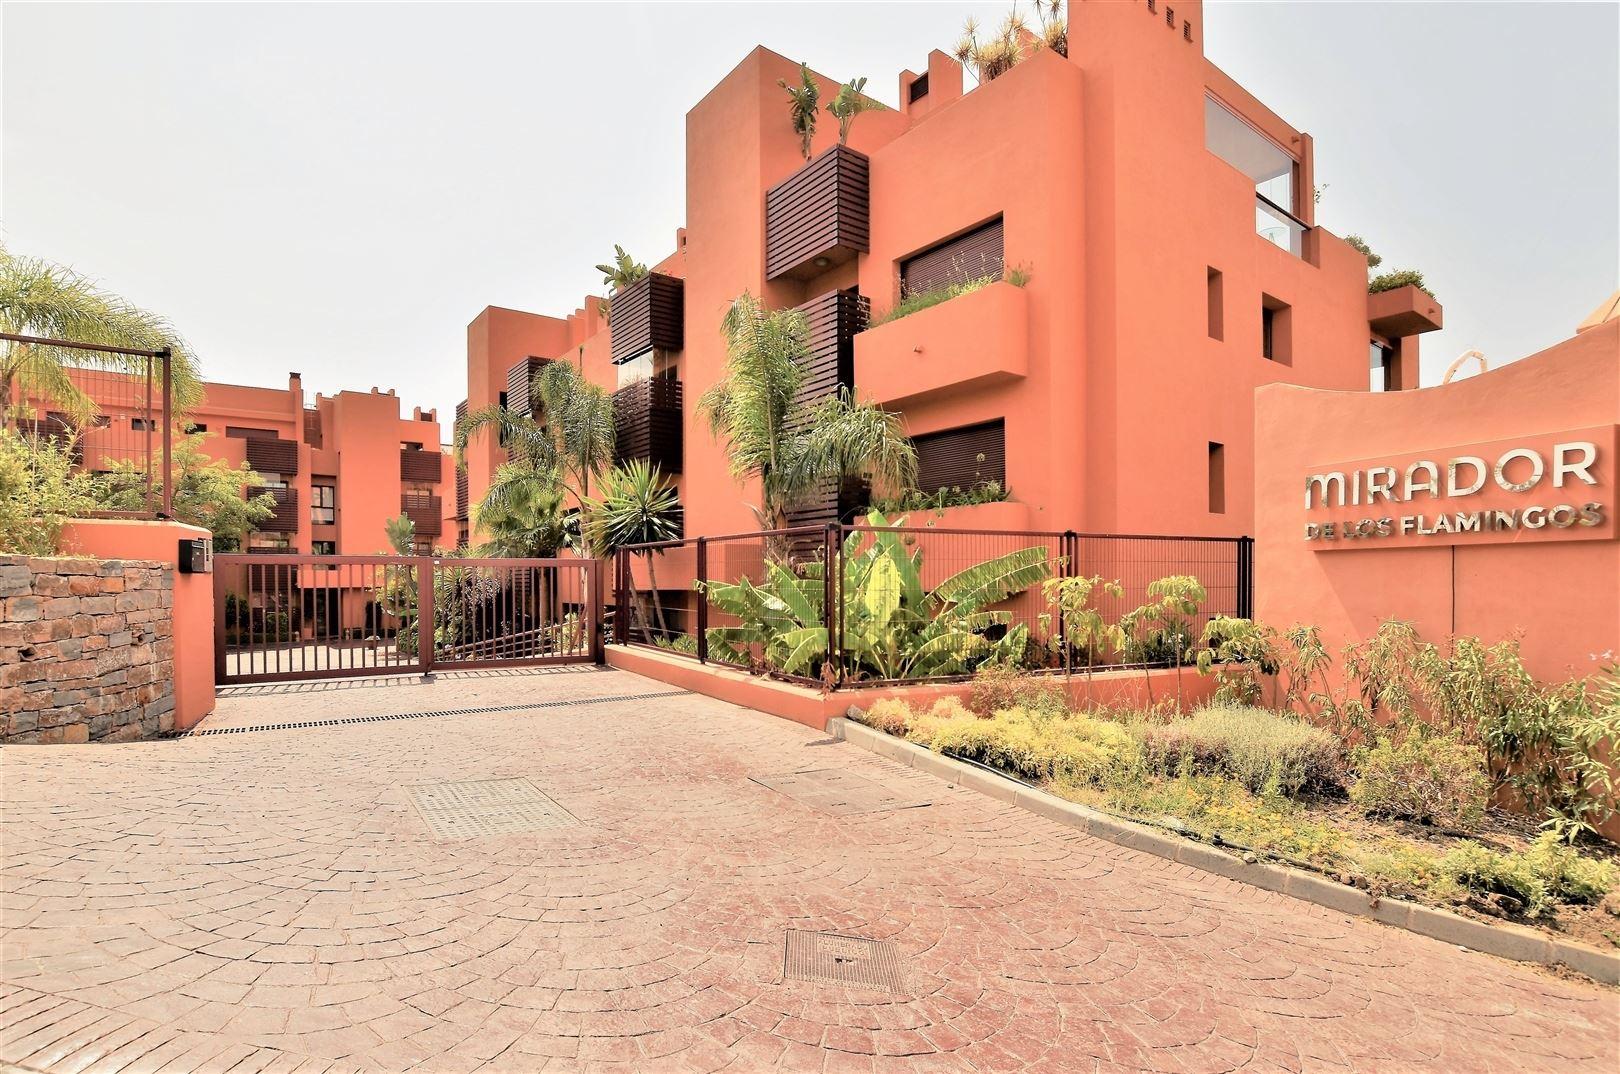 Foto 36 : Appartement te 29679 MARBELLA (Spanje) - Prijs € 1.750